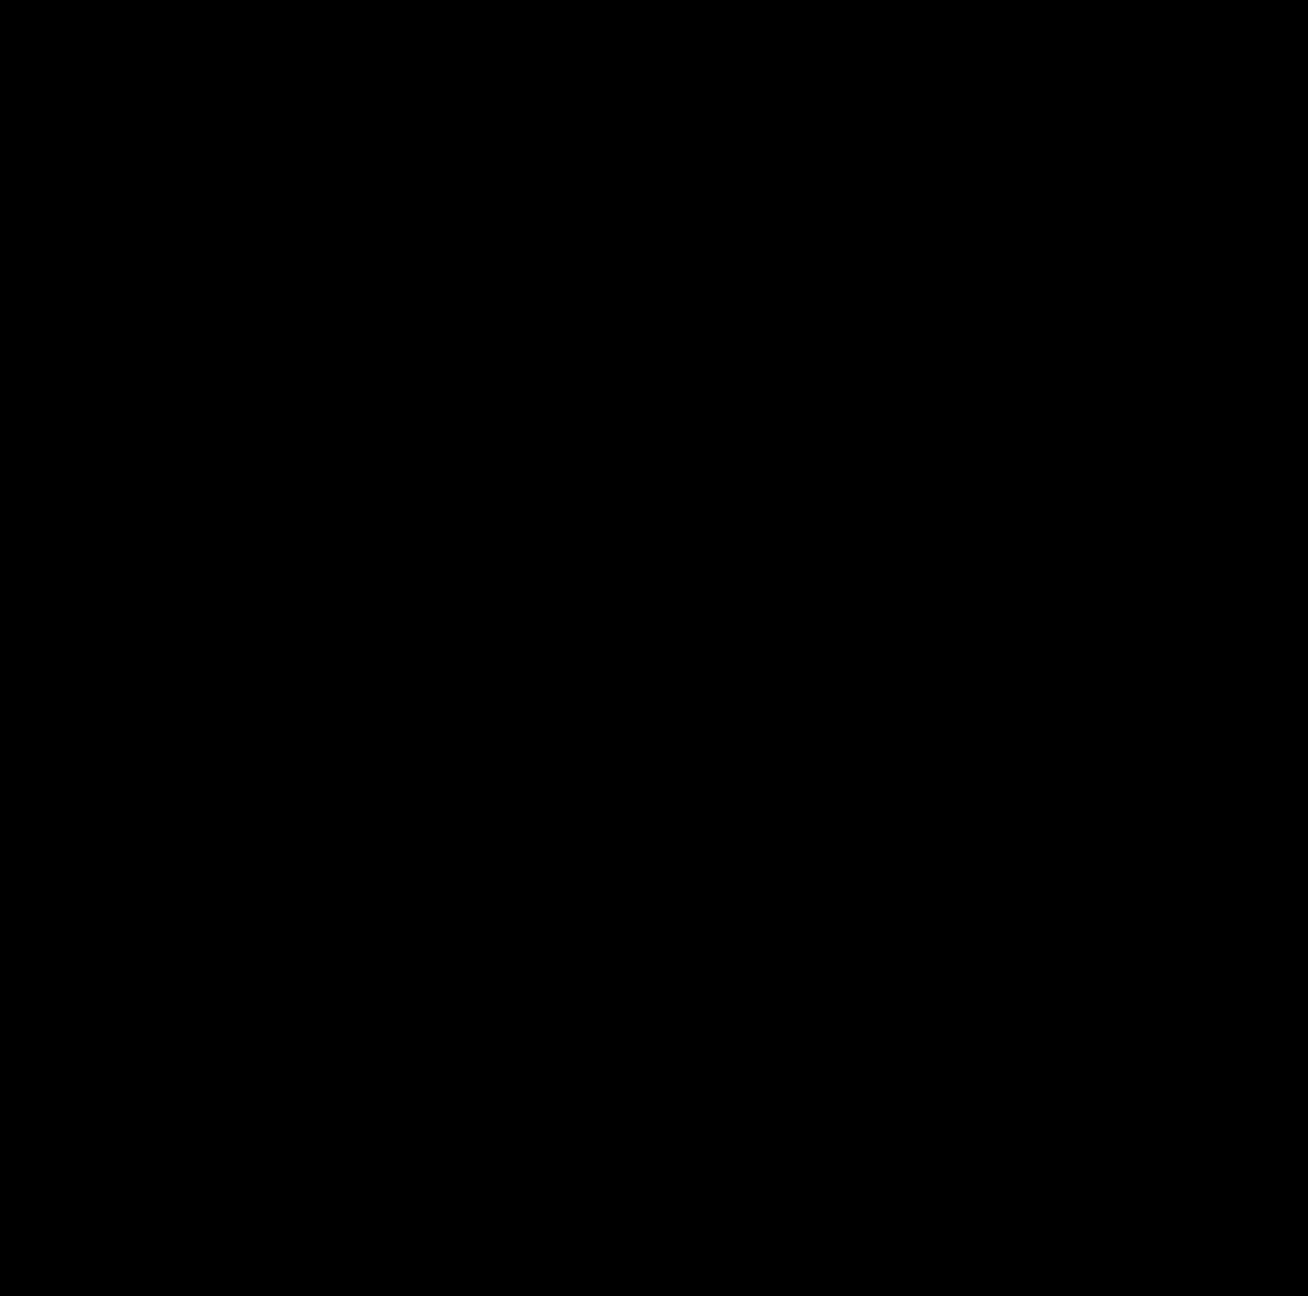 ØRGREEN // IMAGINARY LINES